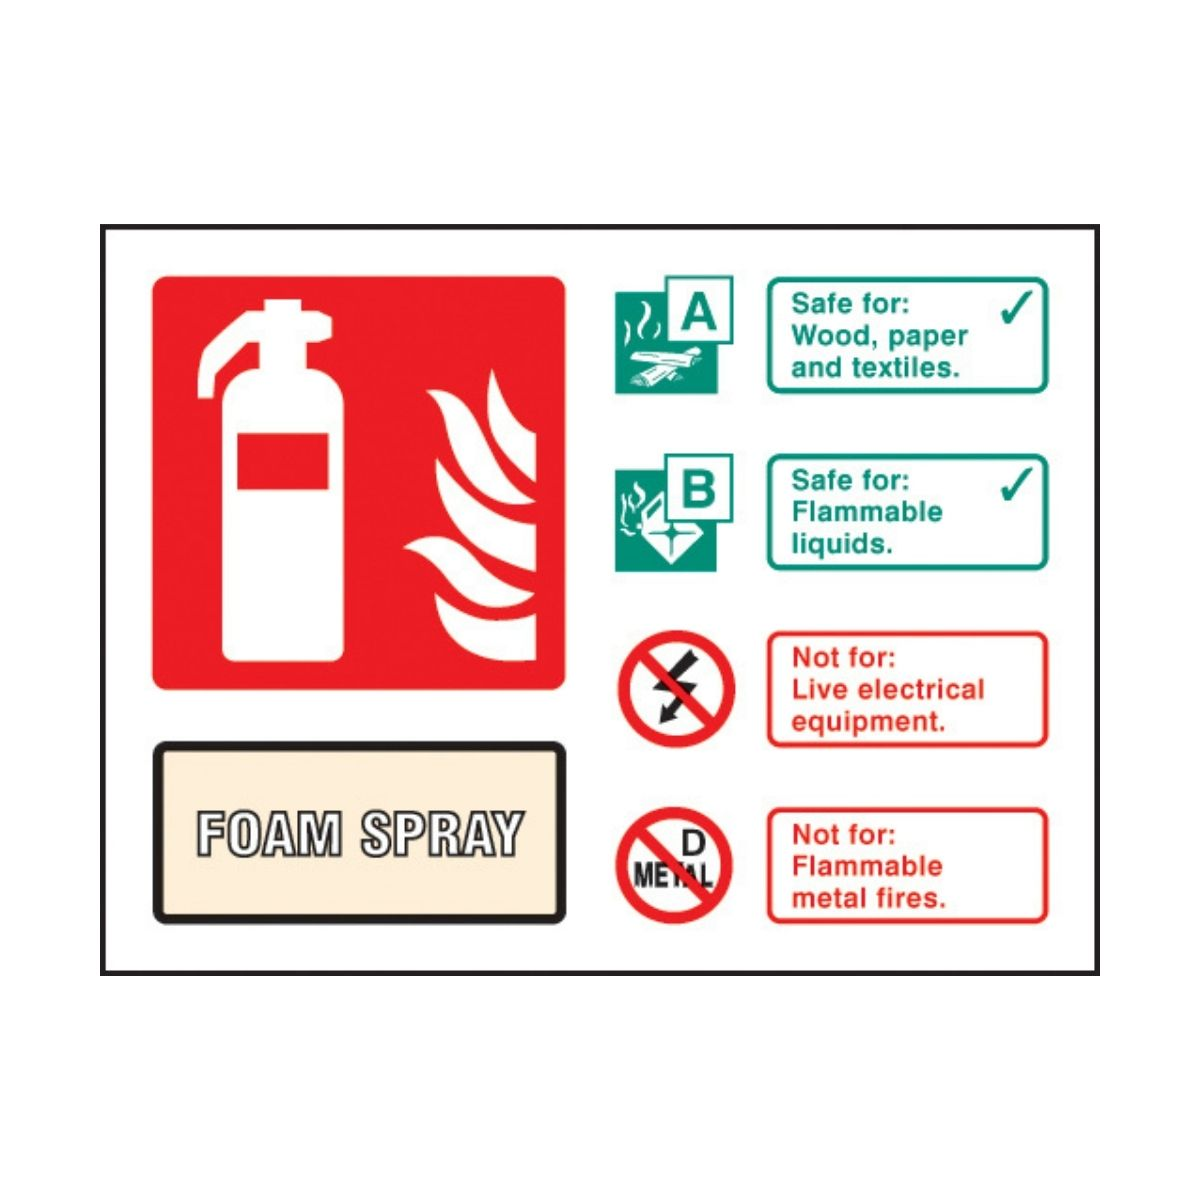 SS31234D Foam Spray Extinguisher Identification (100 x 150mm)